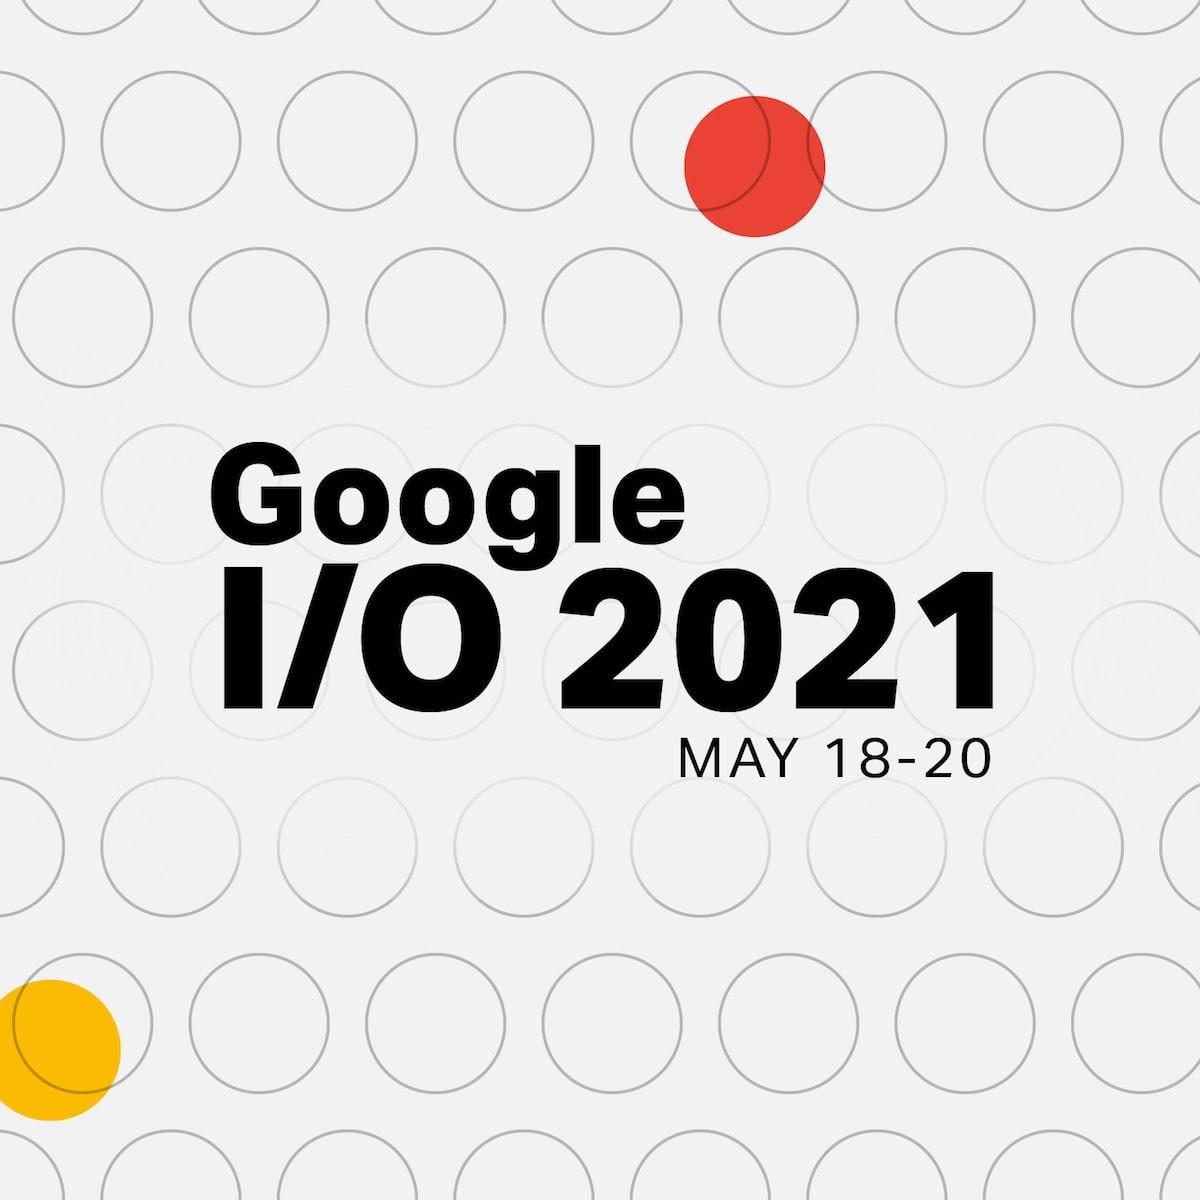 Google I/O 2021 presents Smart Canvas upgrade, Project Starline, & a self-diagnosis tool thumbnail